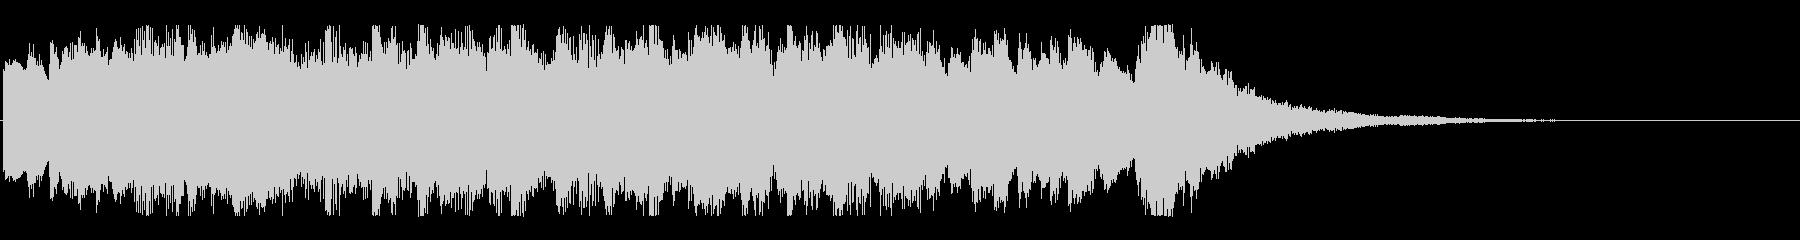 KANT電車発車音系メロディ2の未再生の波形